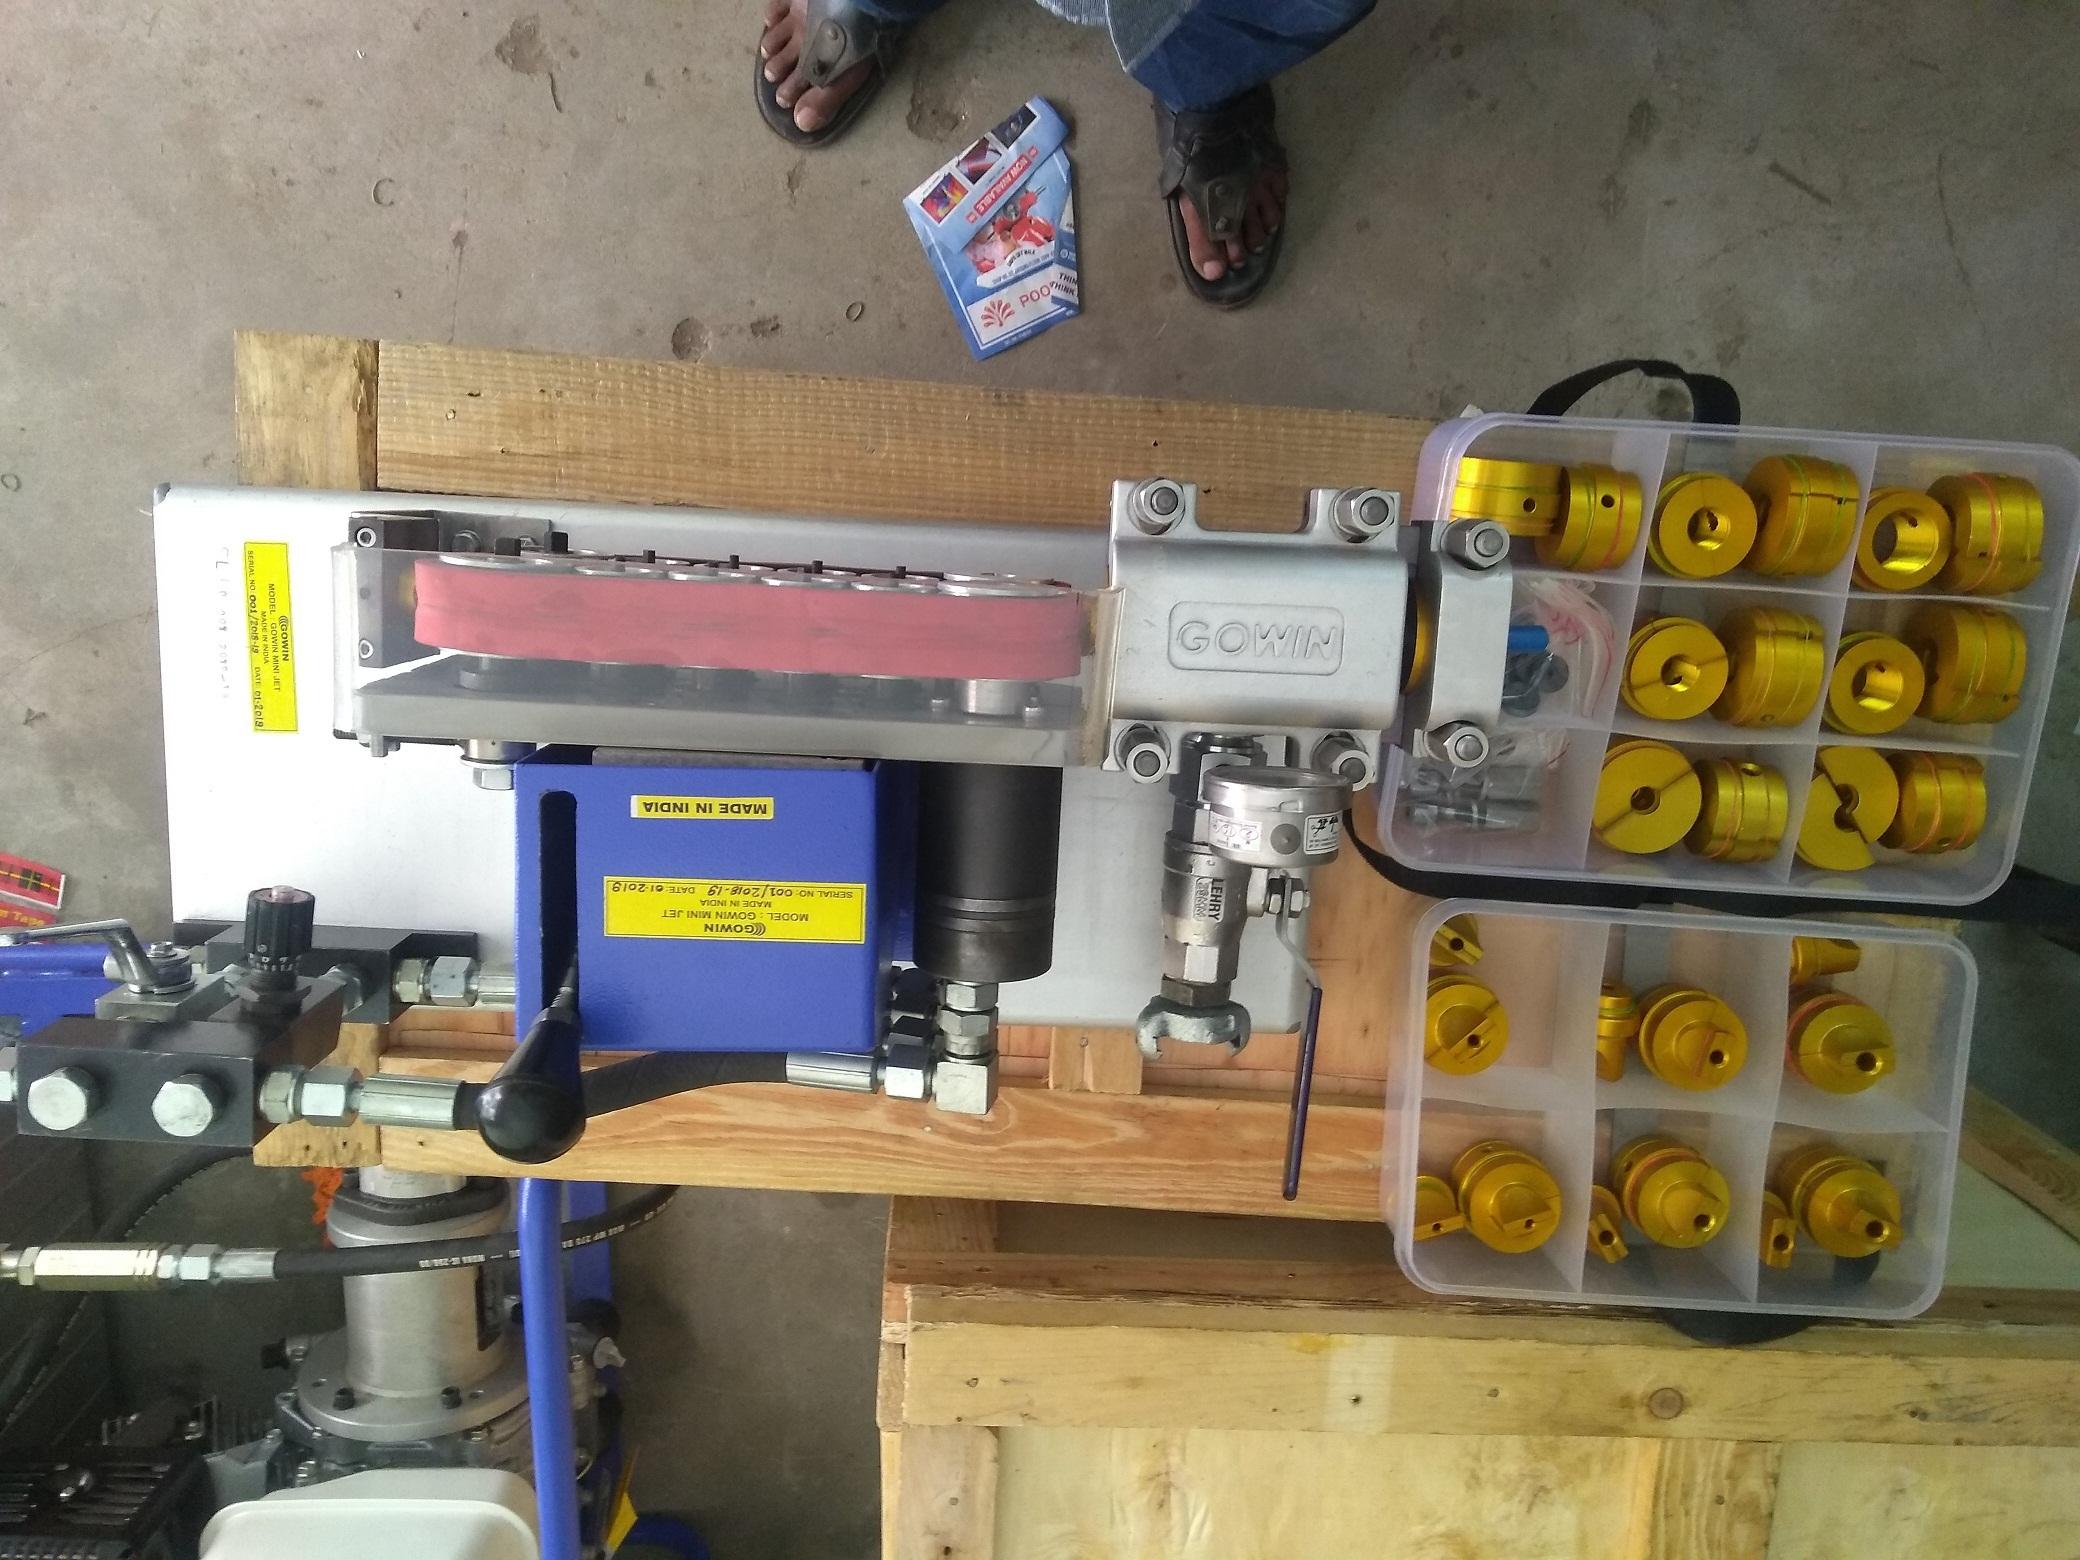 Gowin Minijet Micro Fiber Hydraulic Cable Blowing Machine